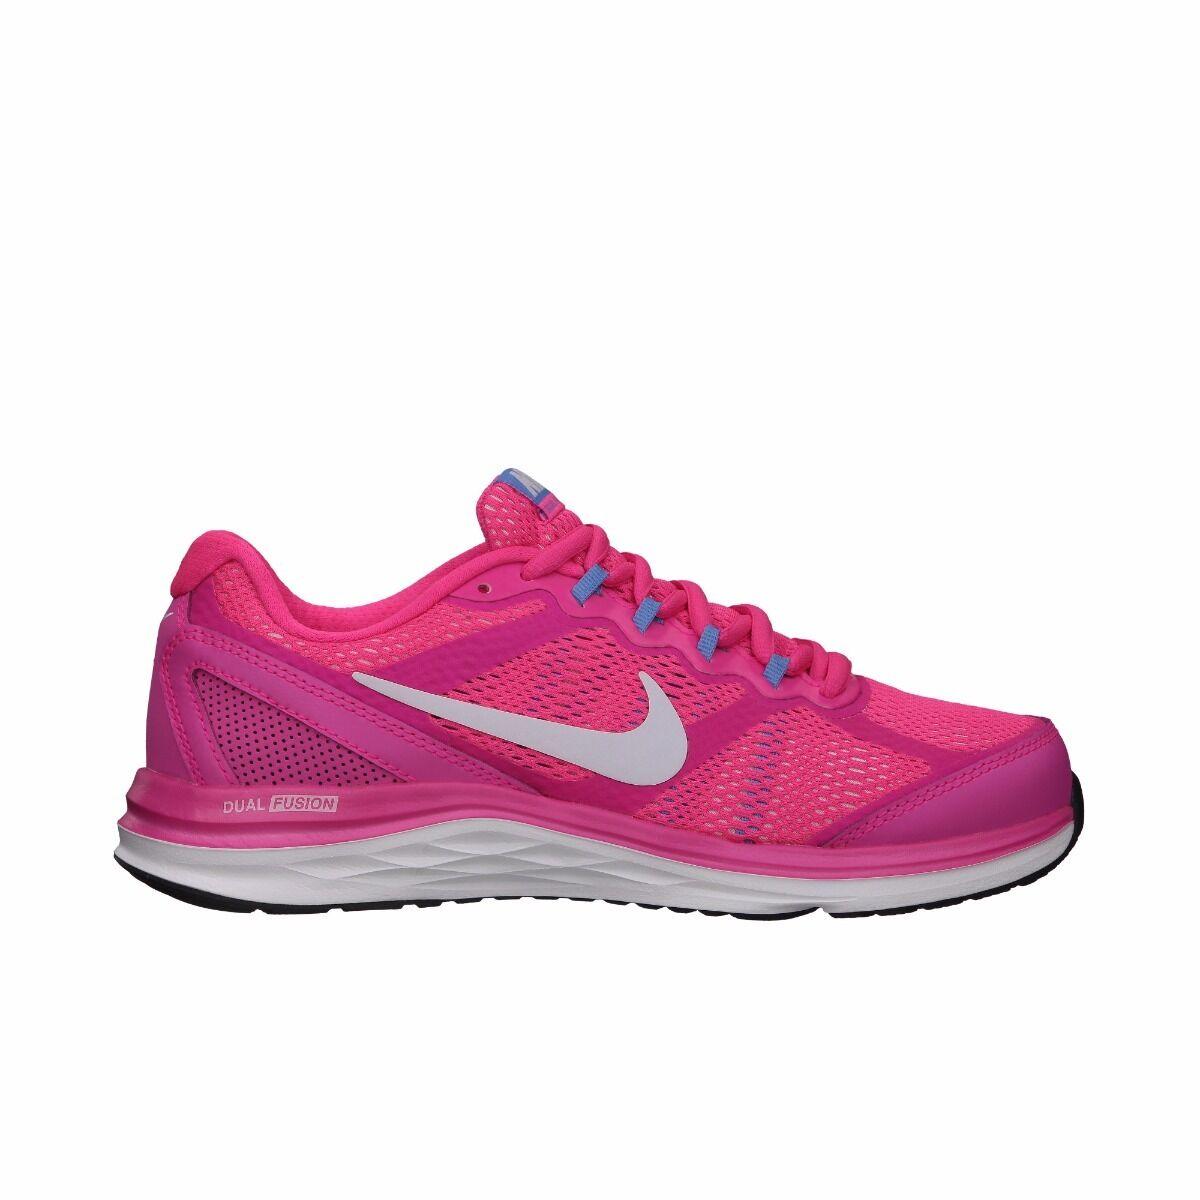 Nike 6 Damen Dual Fusion Run 3 Größe 4.5 - 6 Nike Pink Laufschuhe Turnschuhe bekomme af934a